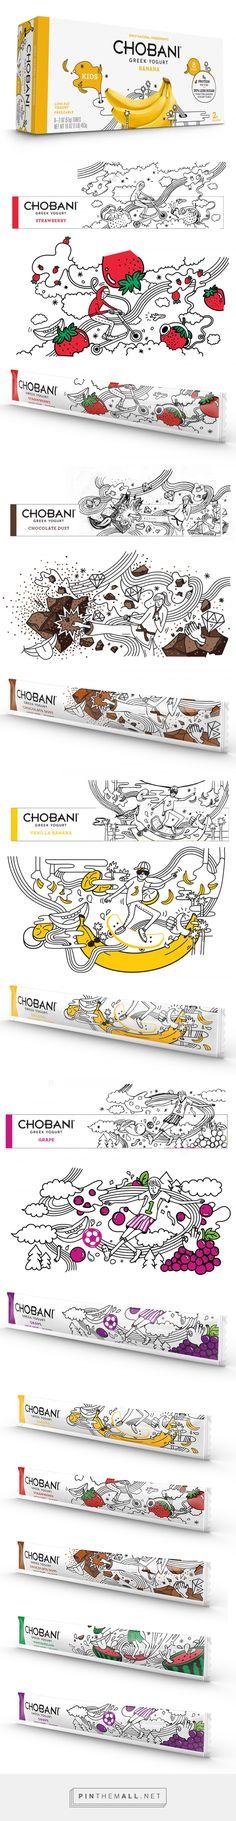 Chobani Yogurt Kids — The Dieline | Packaging & Branding Design & Innovation News